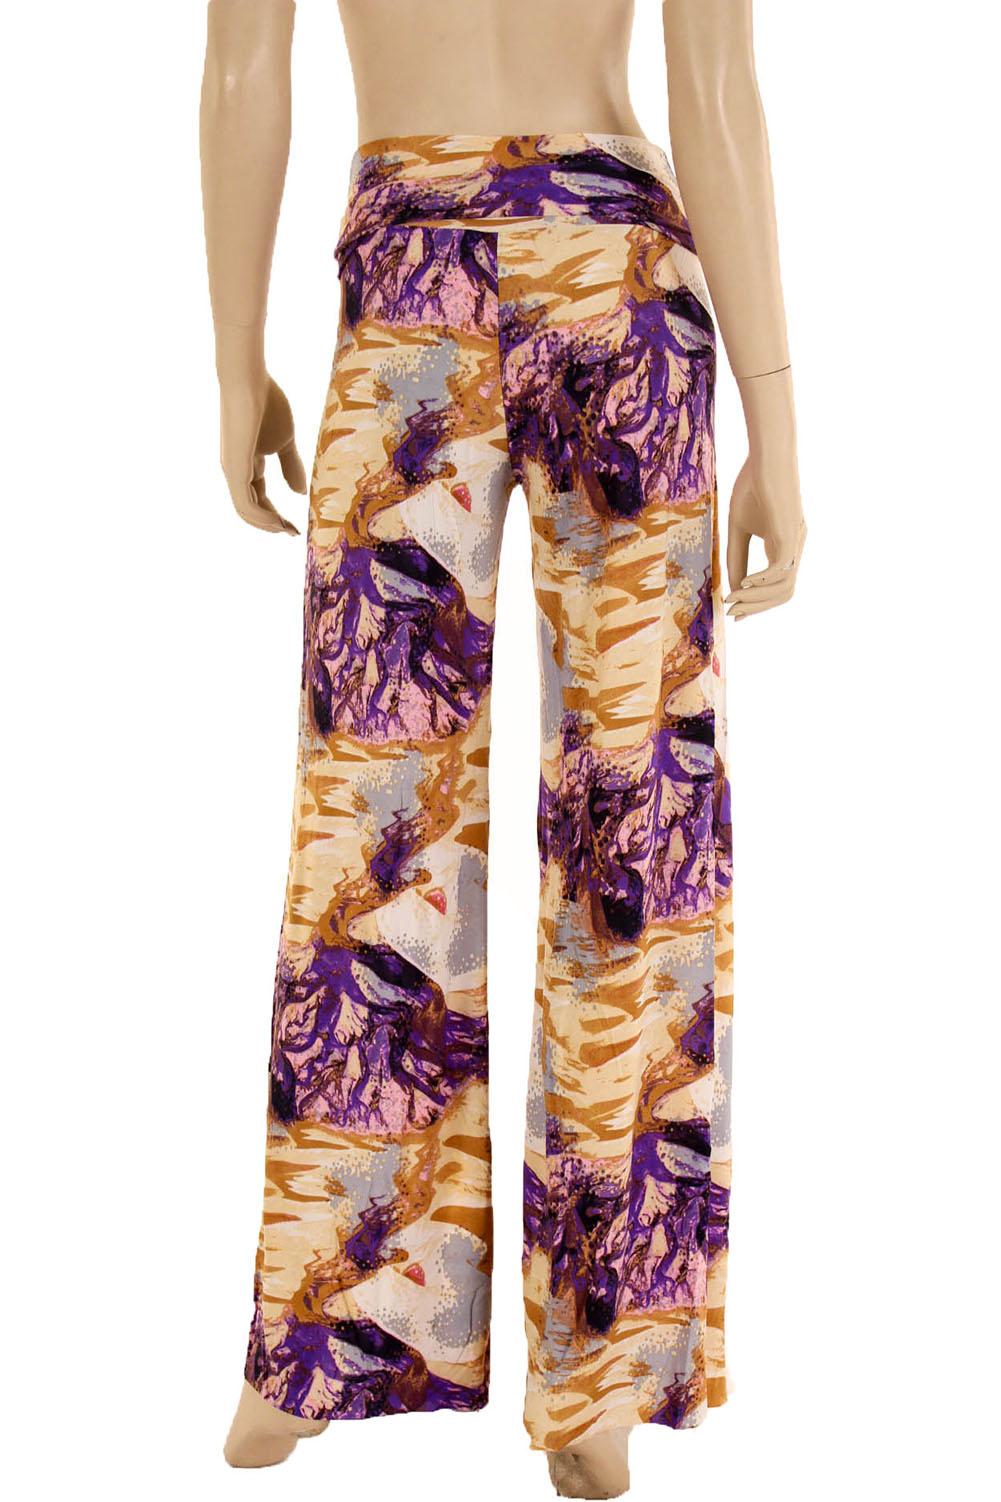 58930e7f4f23c Womens Palazzo Pants Wide Leg Loose Printed Stretch Long Bohemian ...